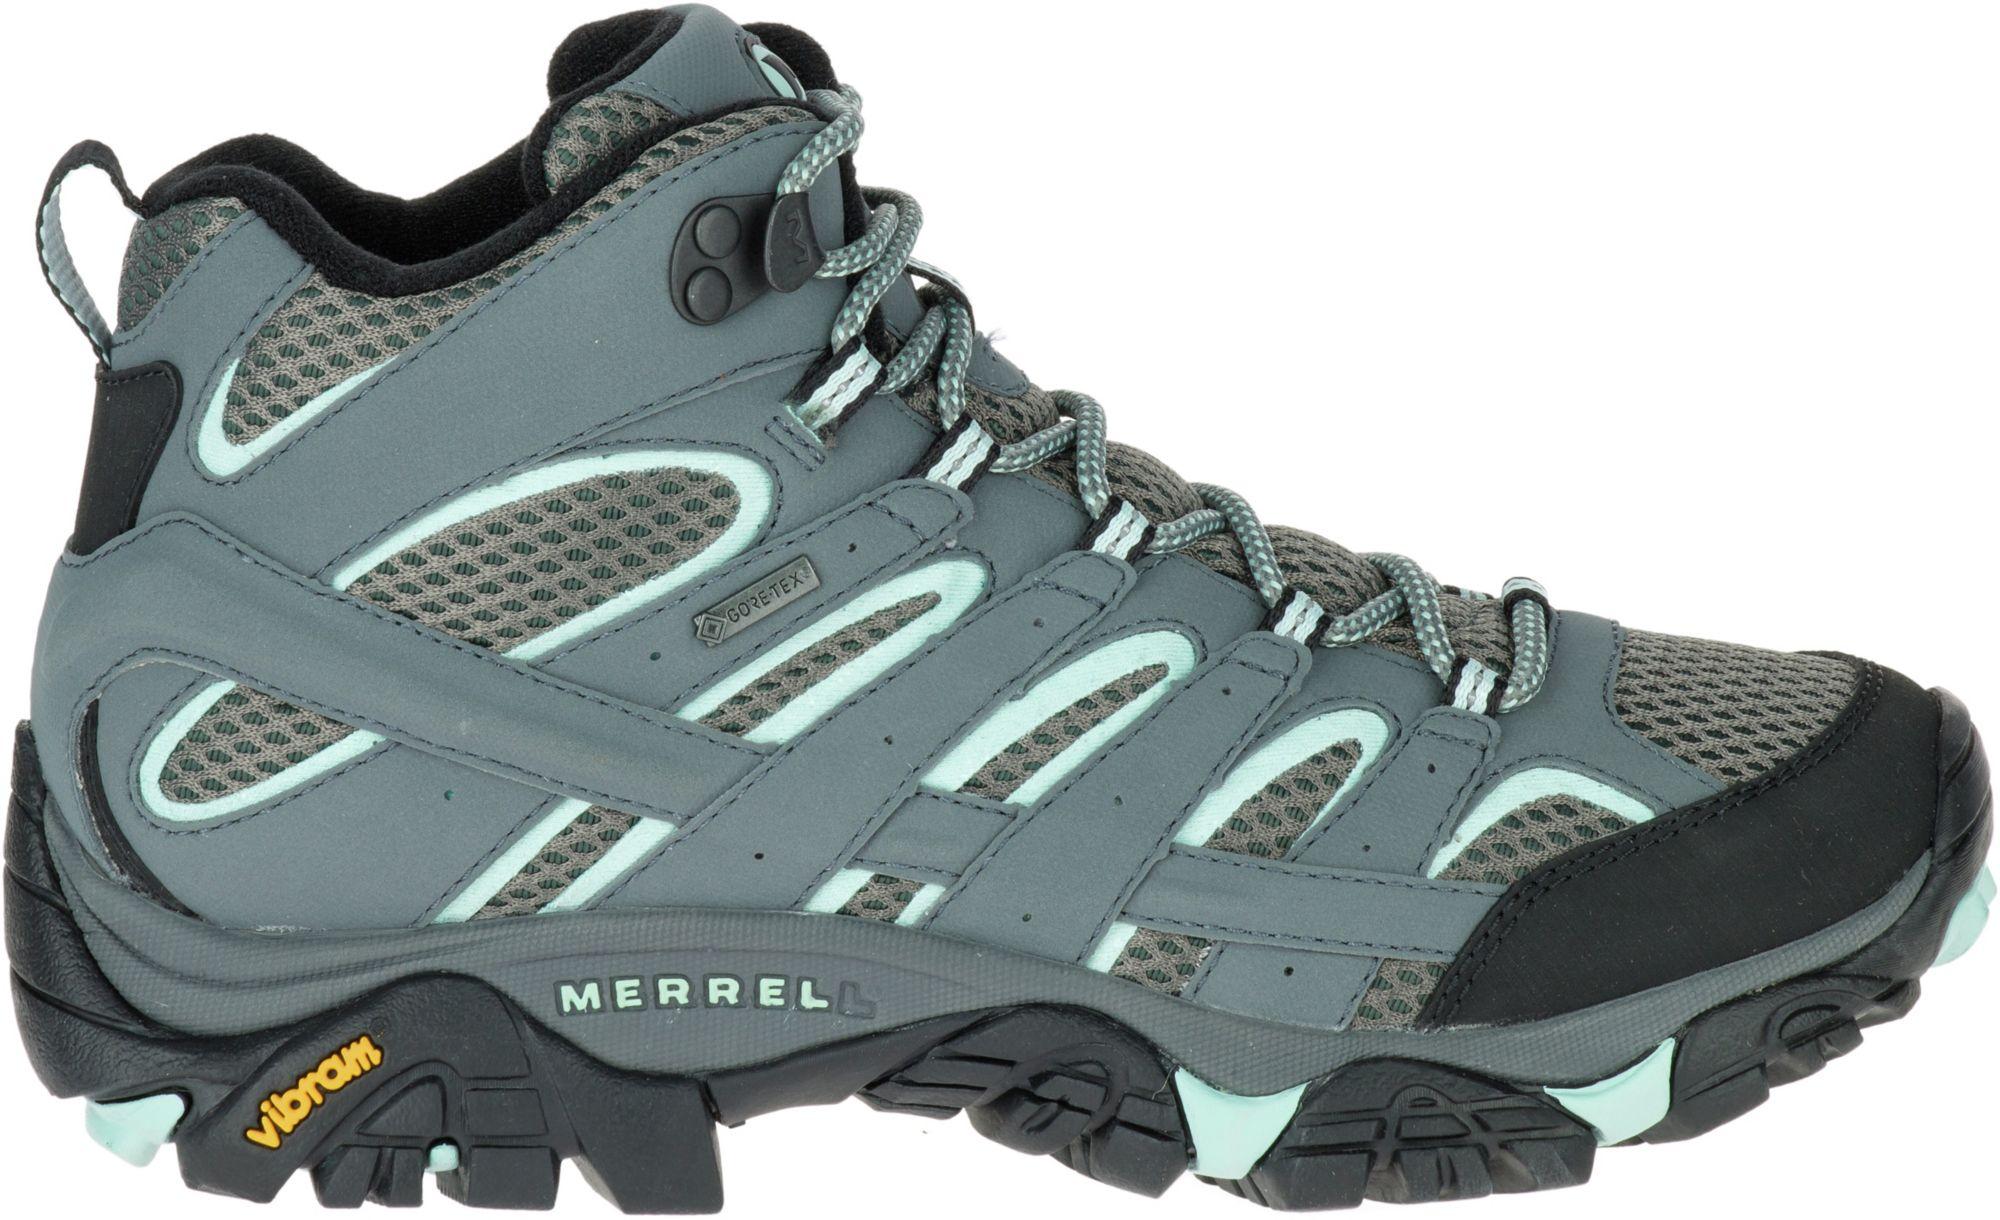 32d01d7bcf8 Merrell Women s Moab 2 Mid GORE-TEX Hiking Boots